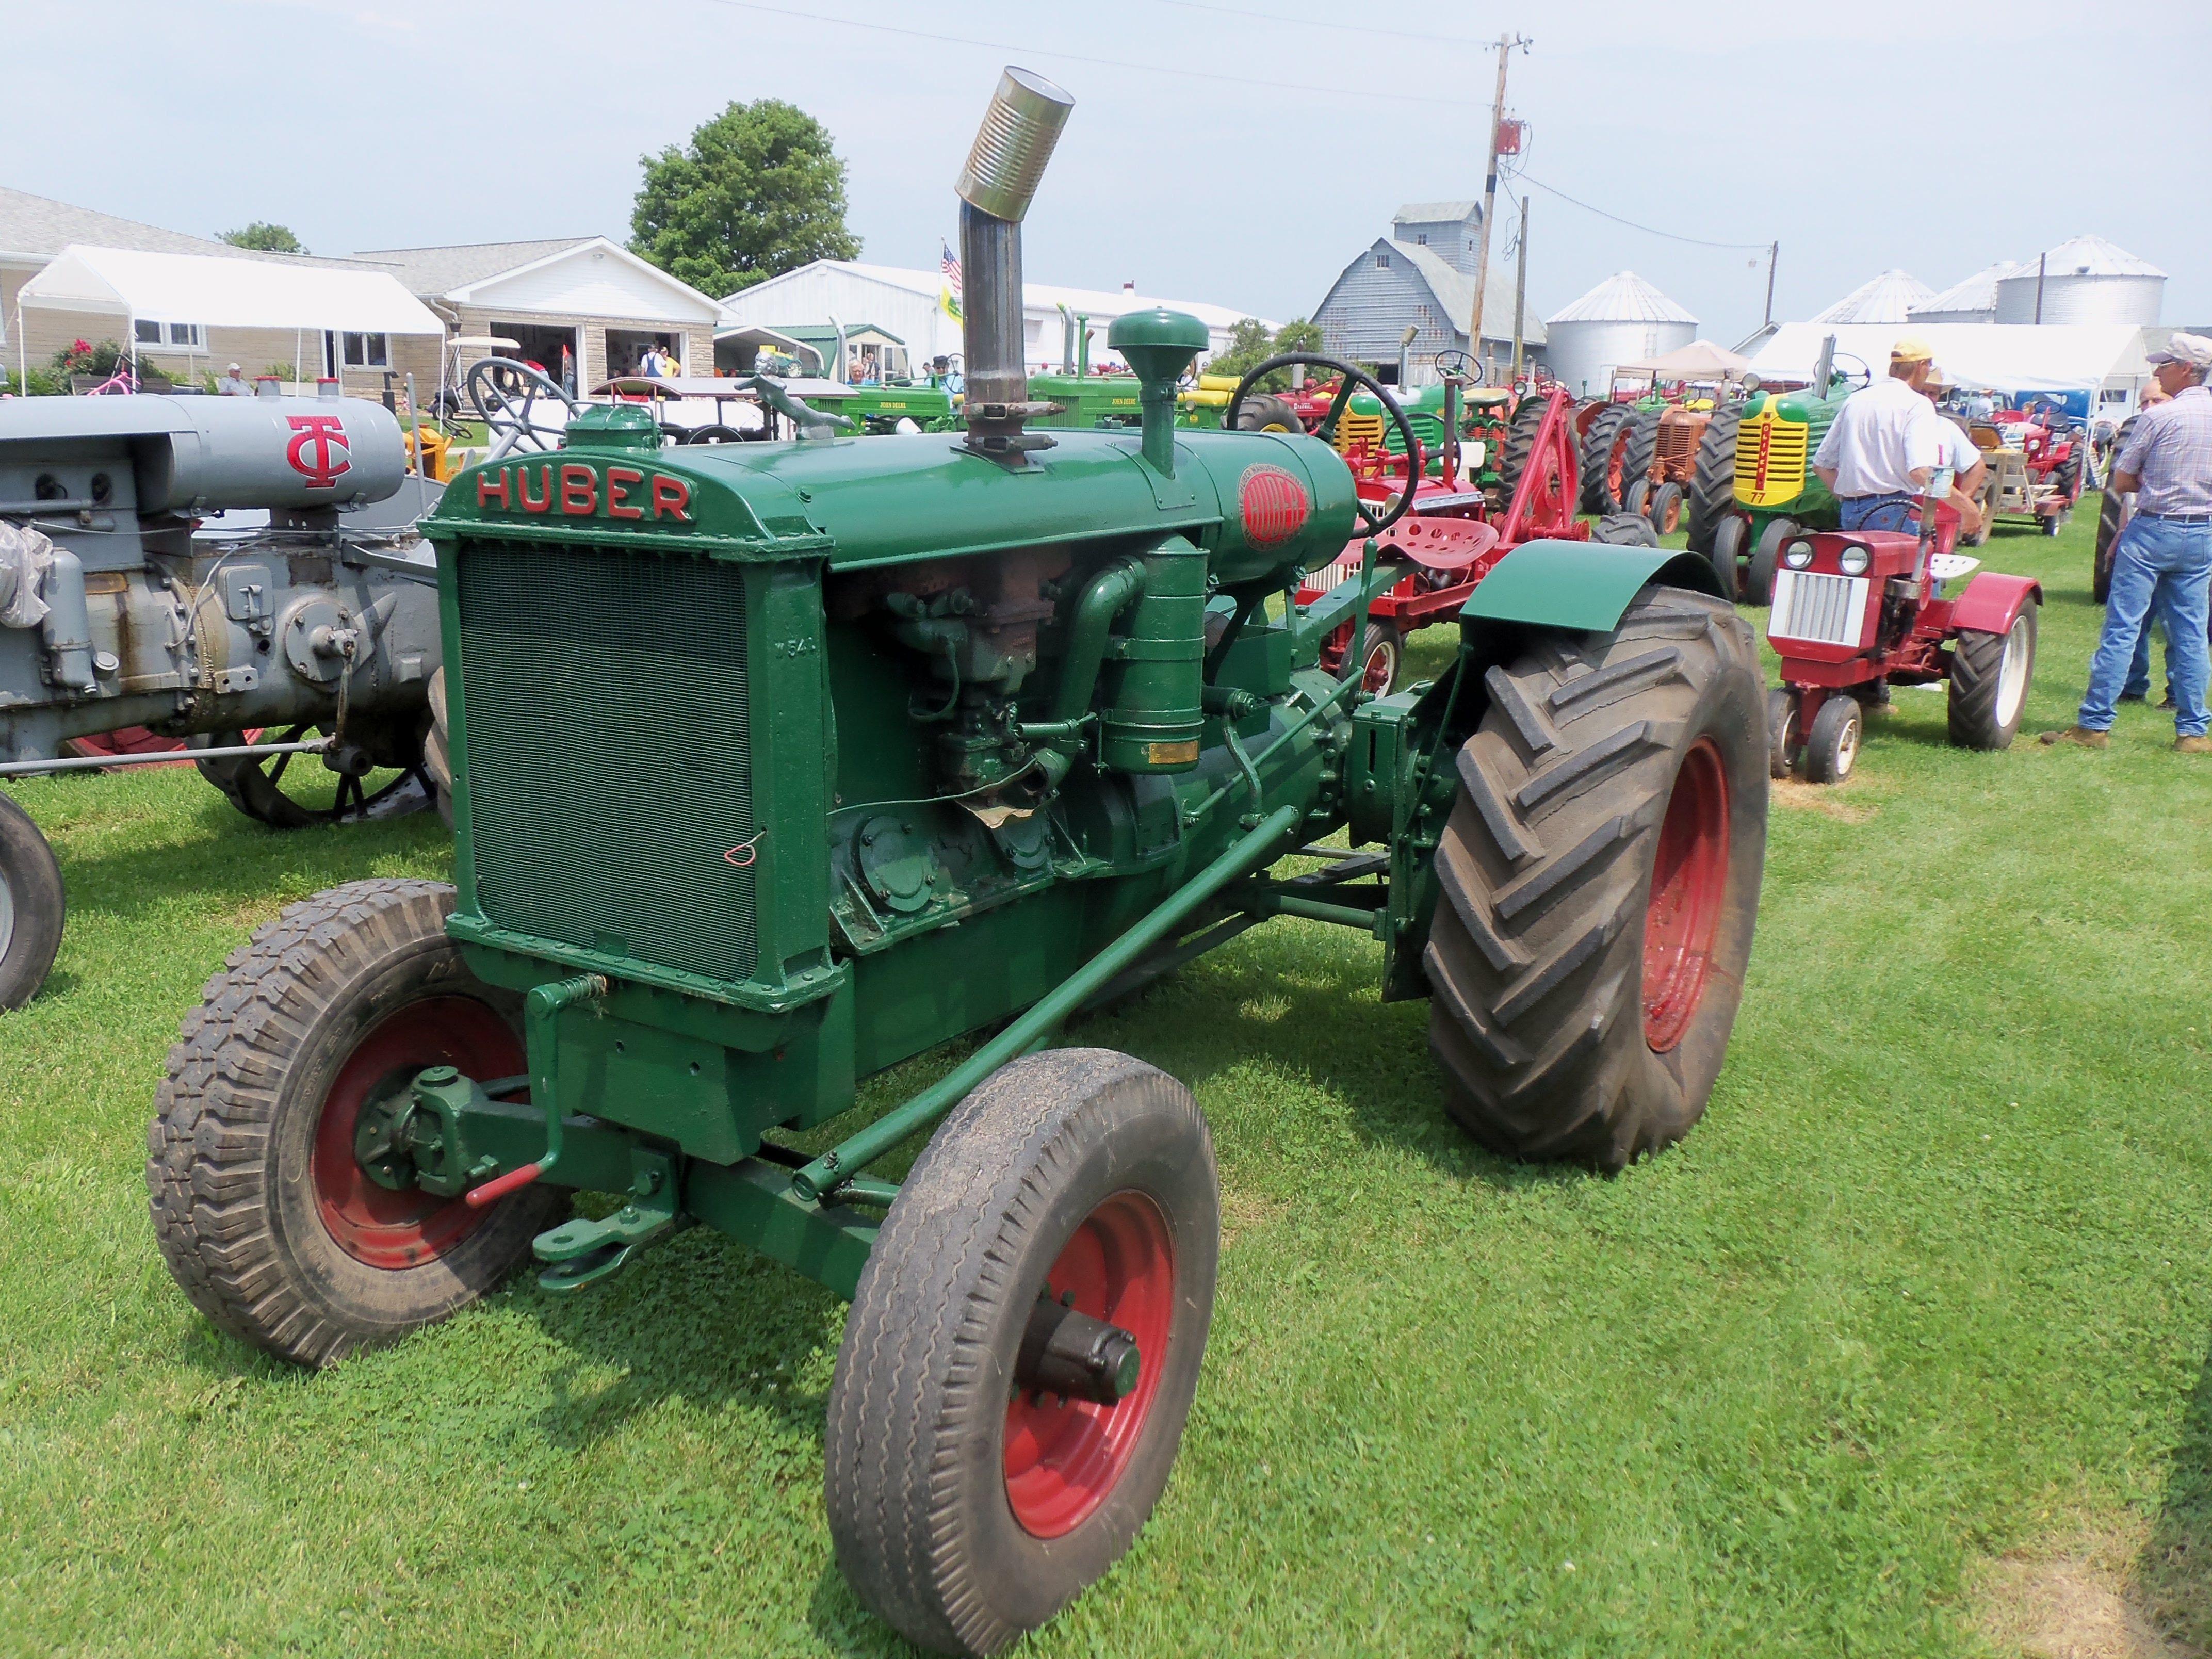 Antique Tractors In Ohio : Huber tractor from marion ohio farm equipment